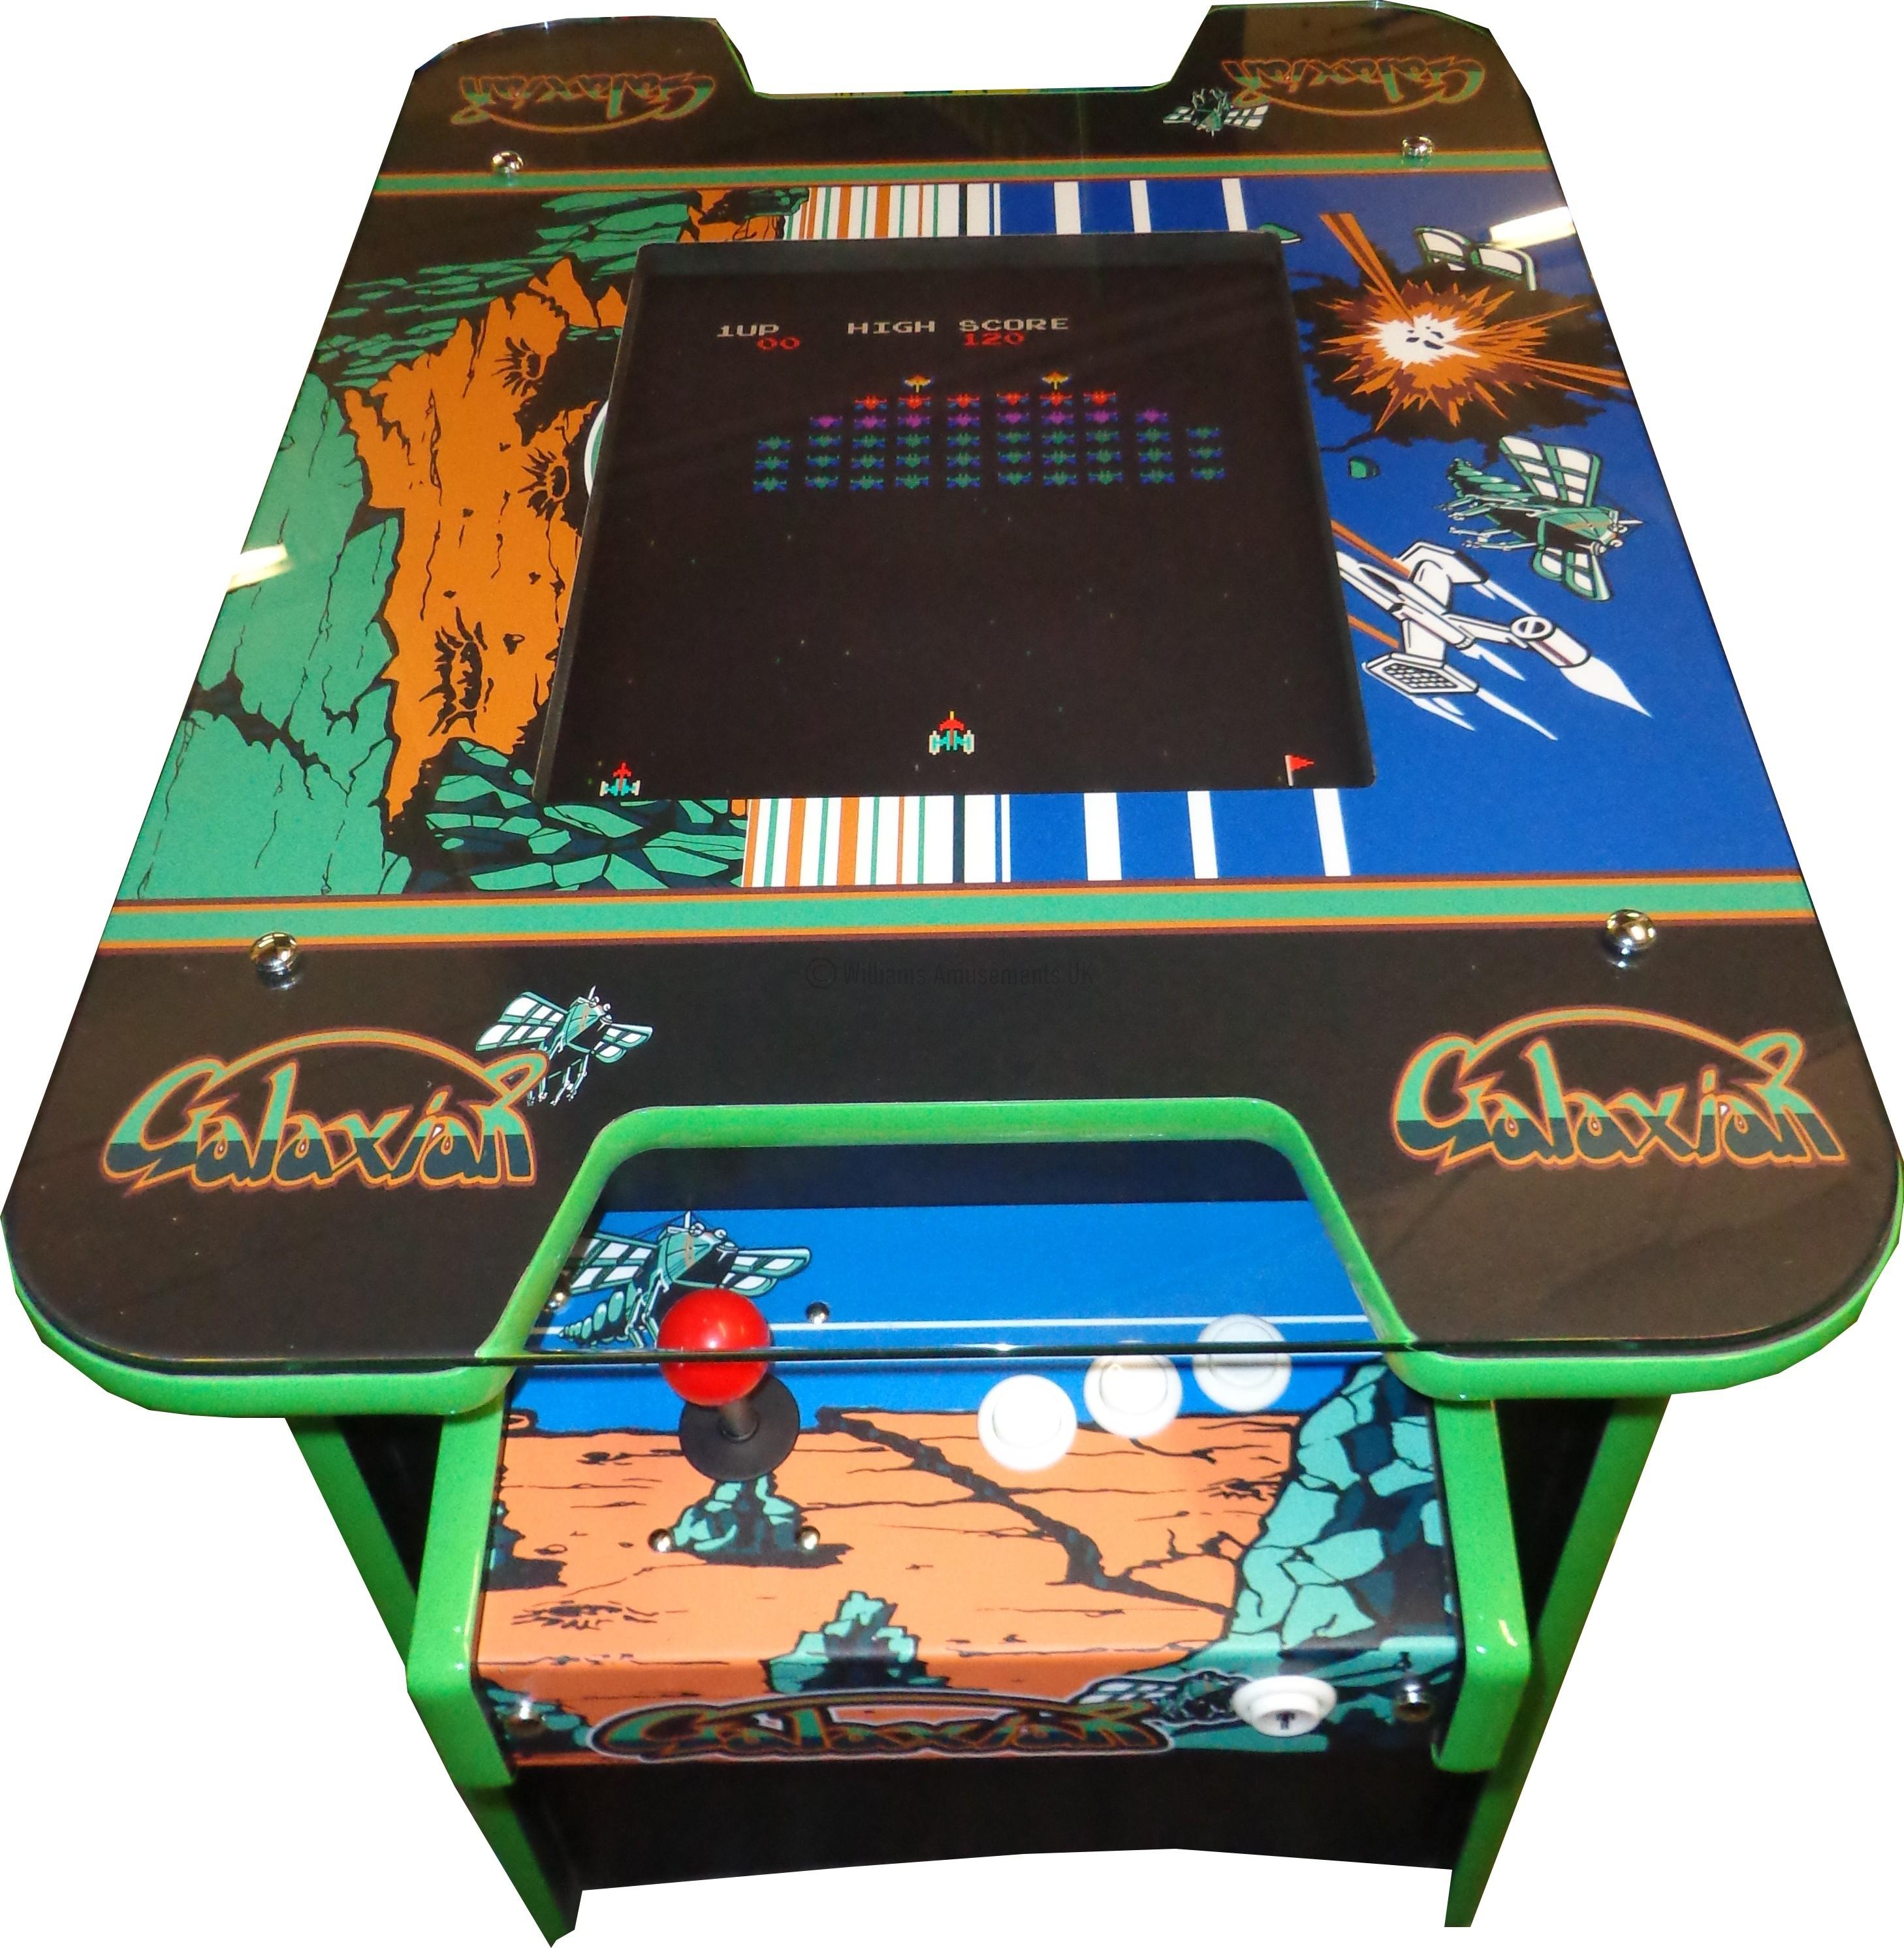 galaxian arcade machine for sale